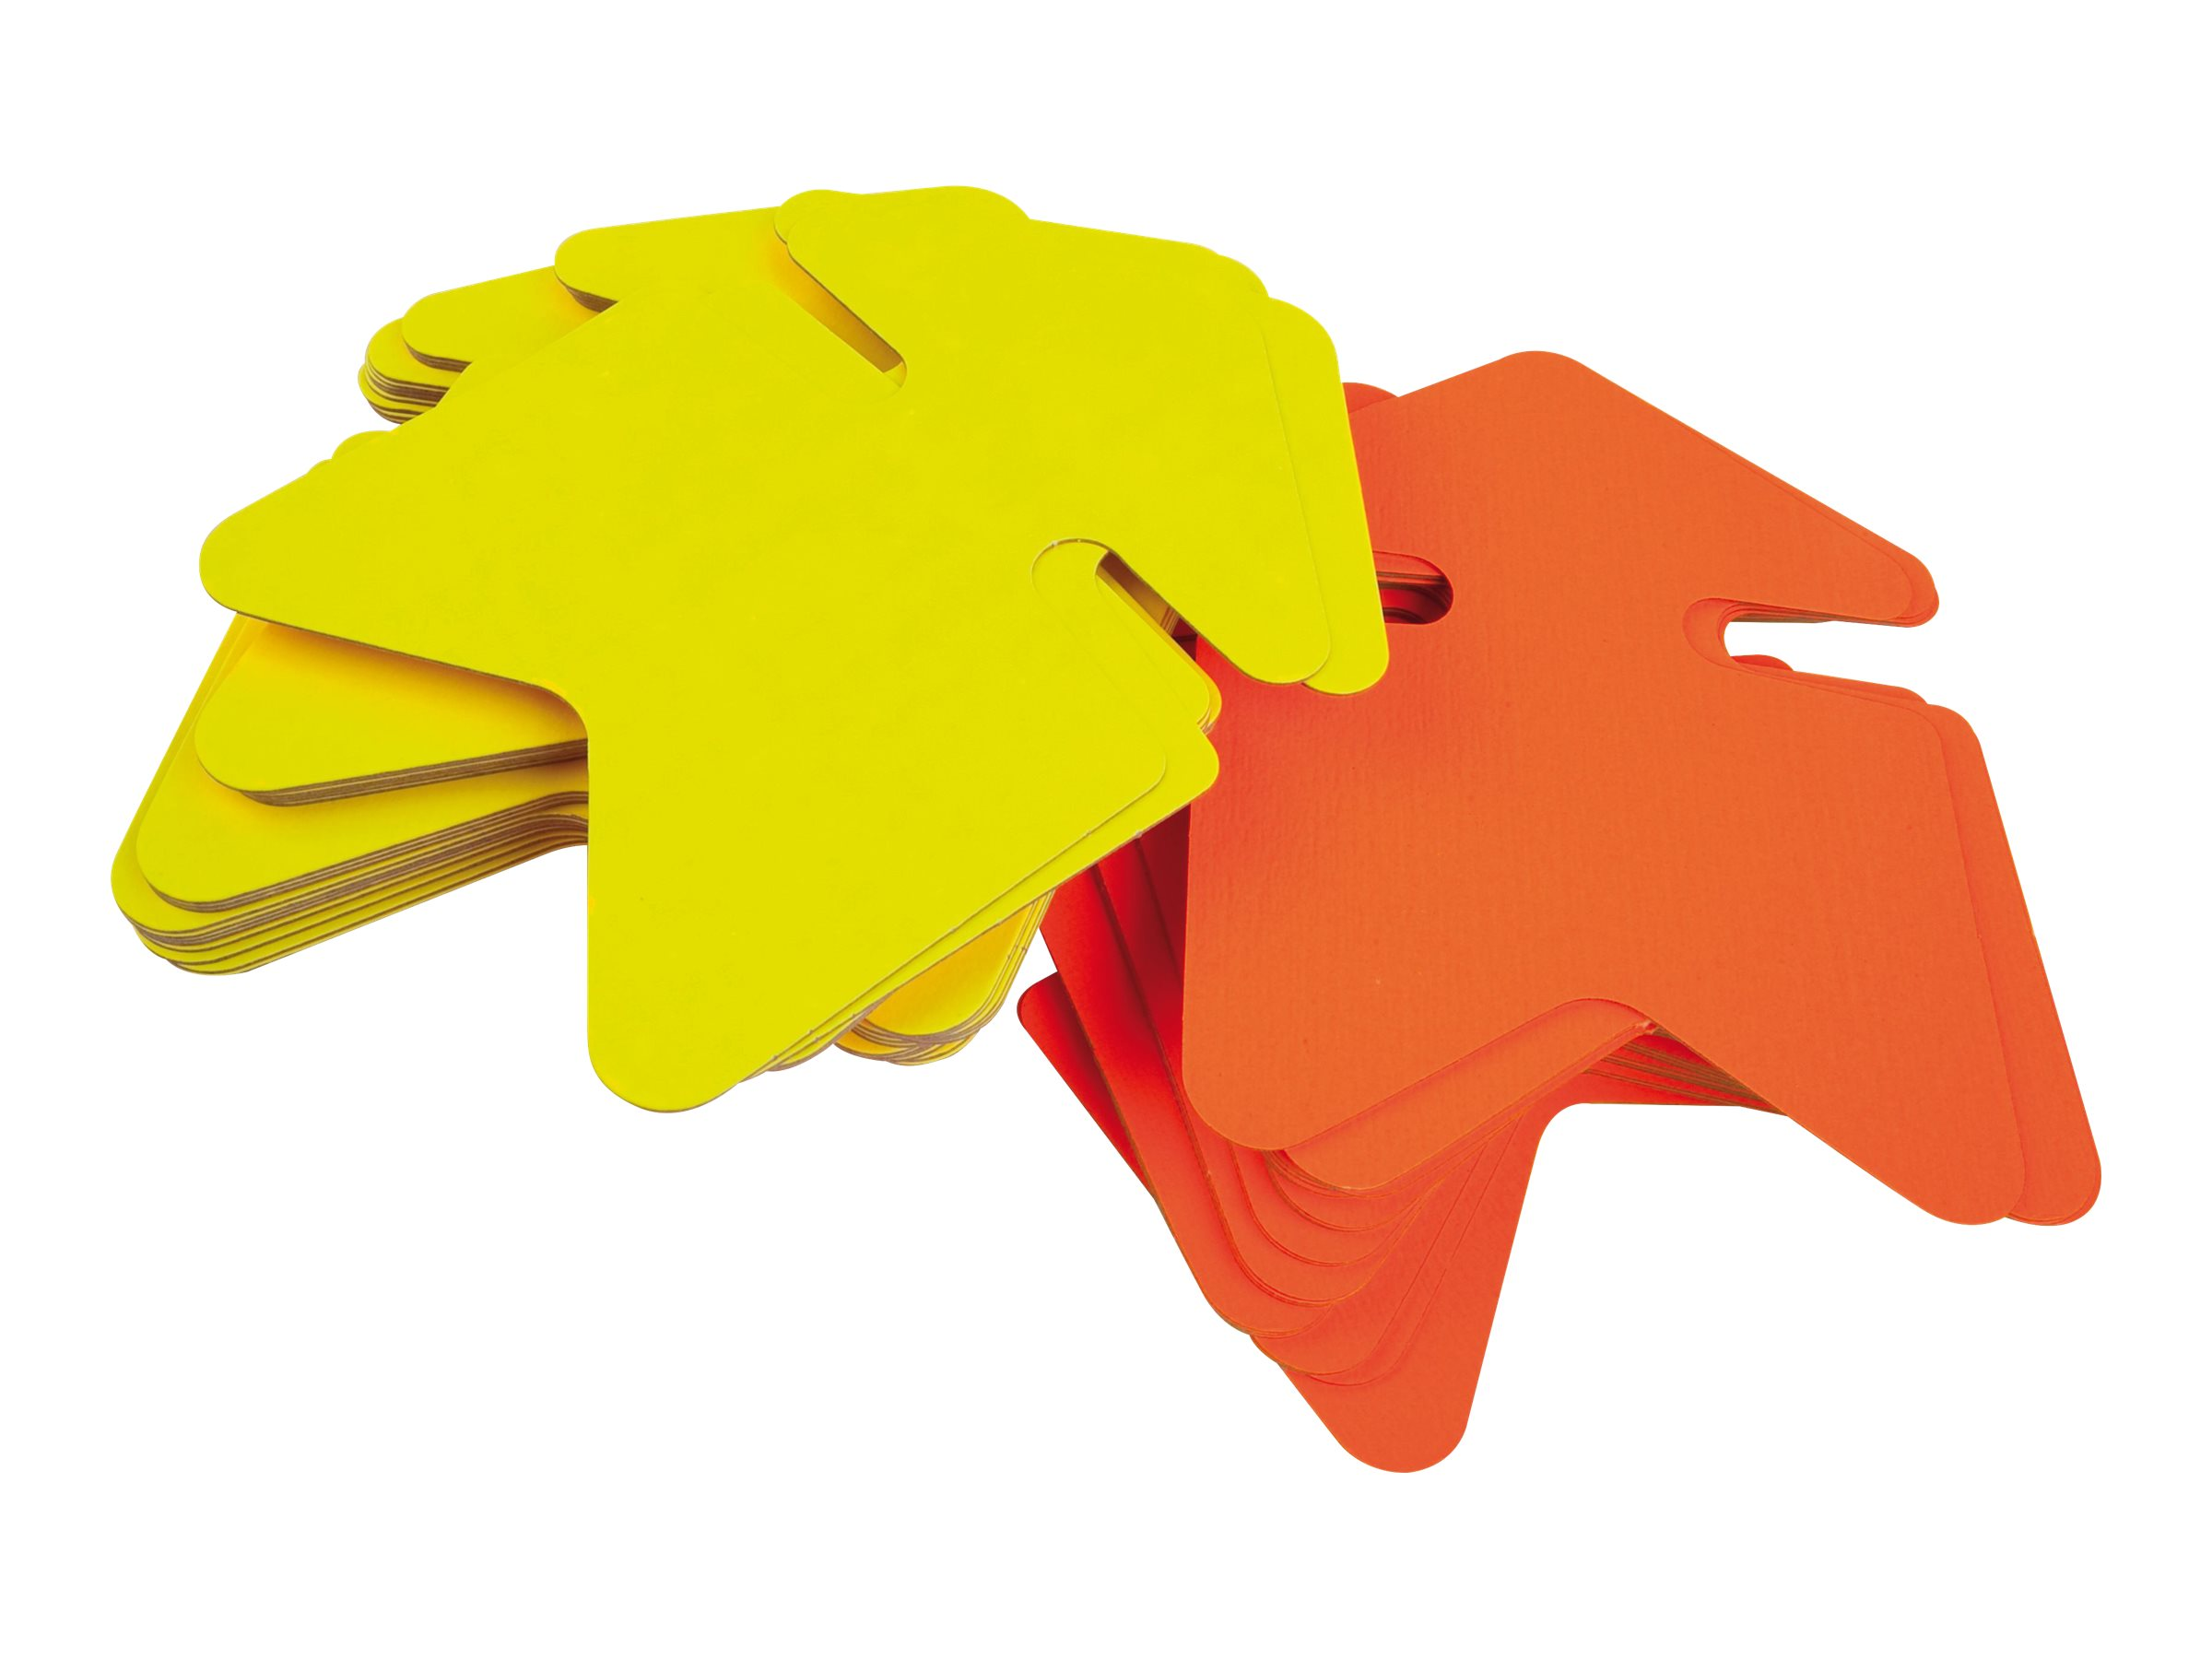 Apli Agipa - 25 flèches fluo non effaçables - jaune/orange - 24 x 32 cm